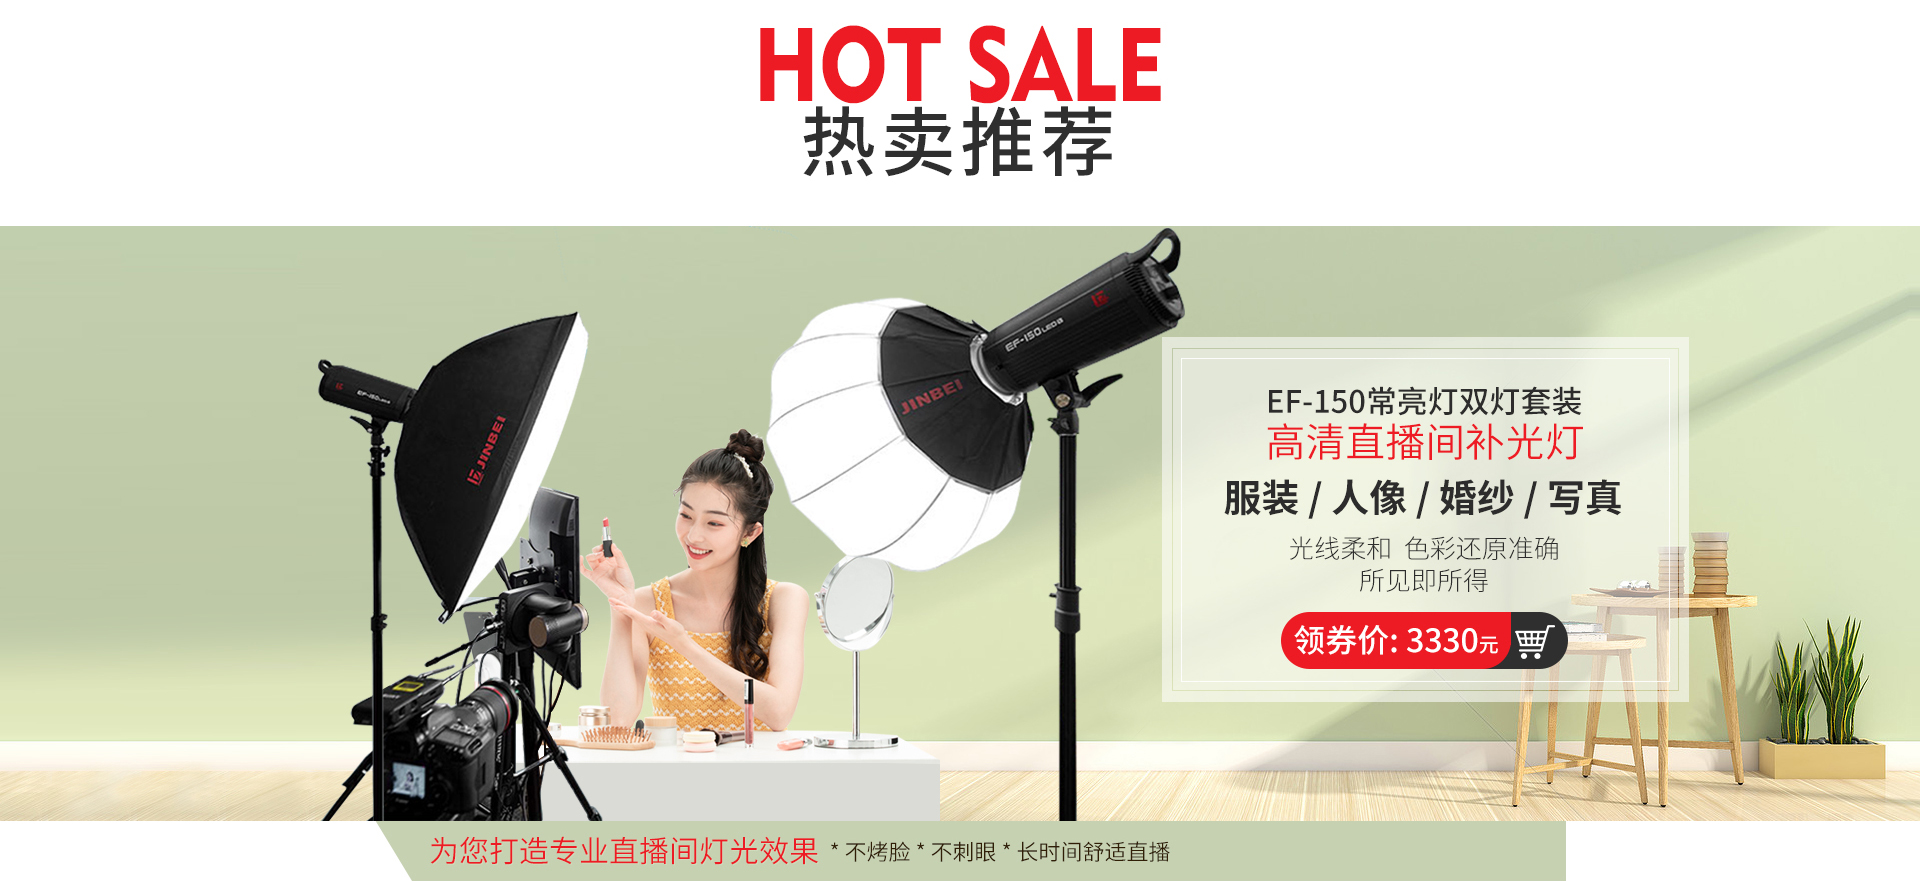 hot-sale1.jpg